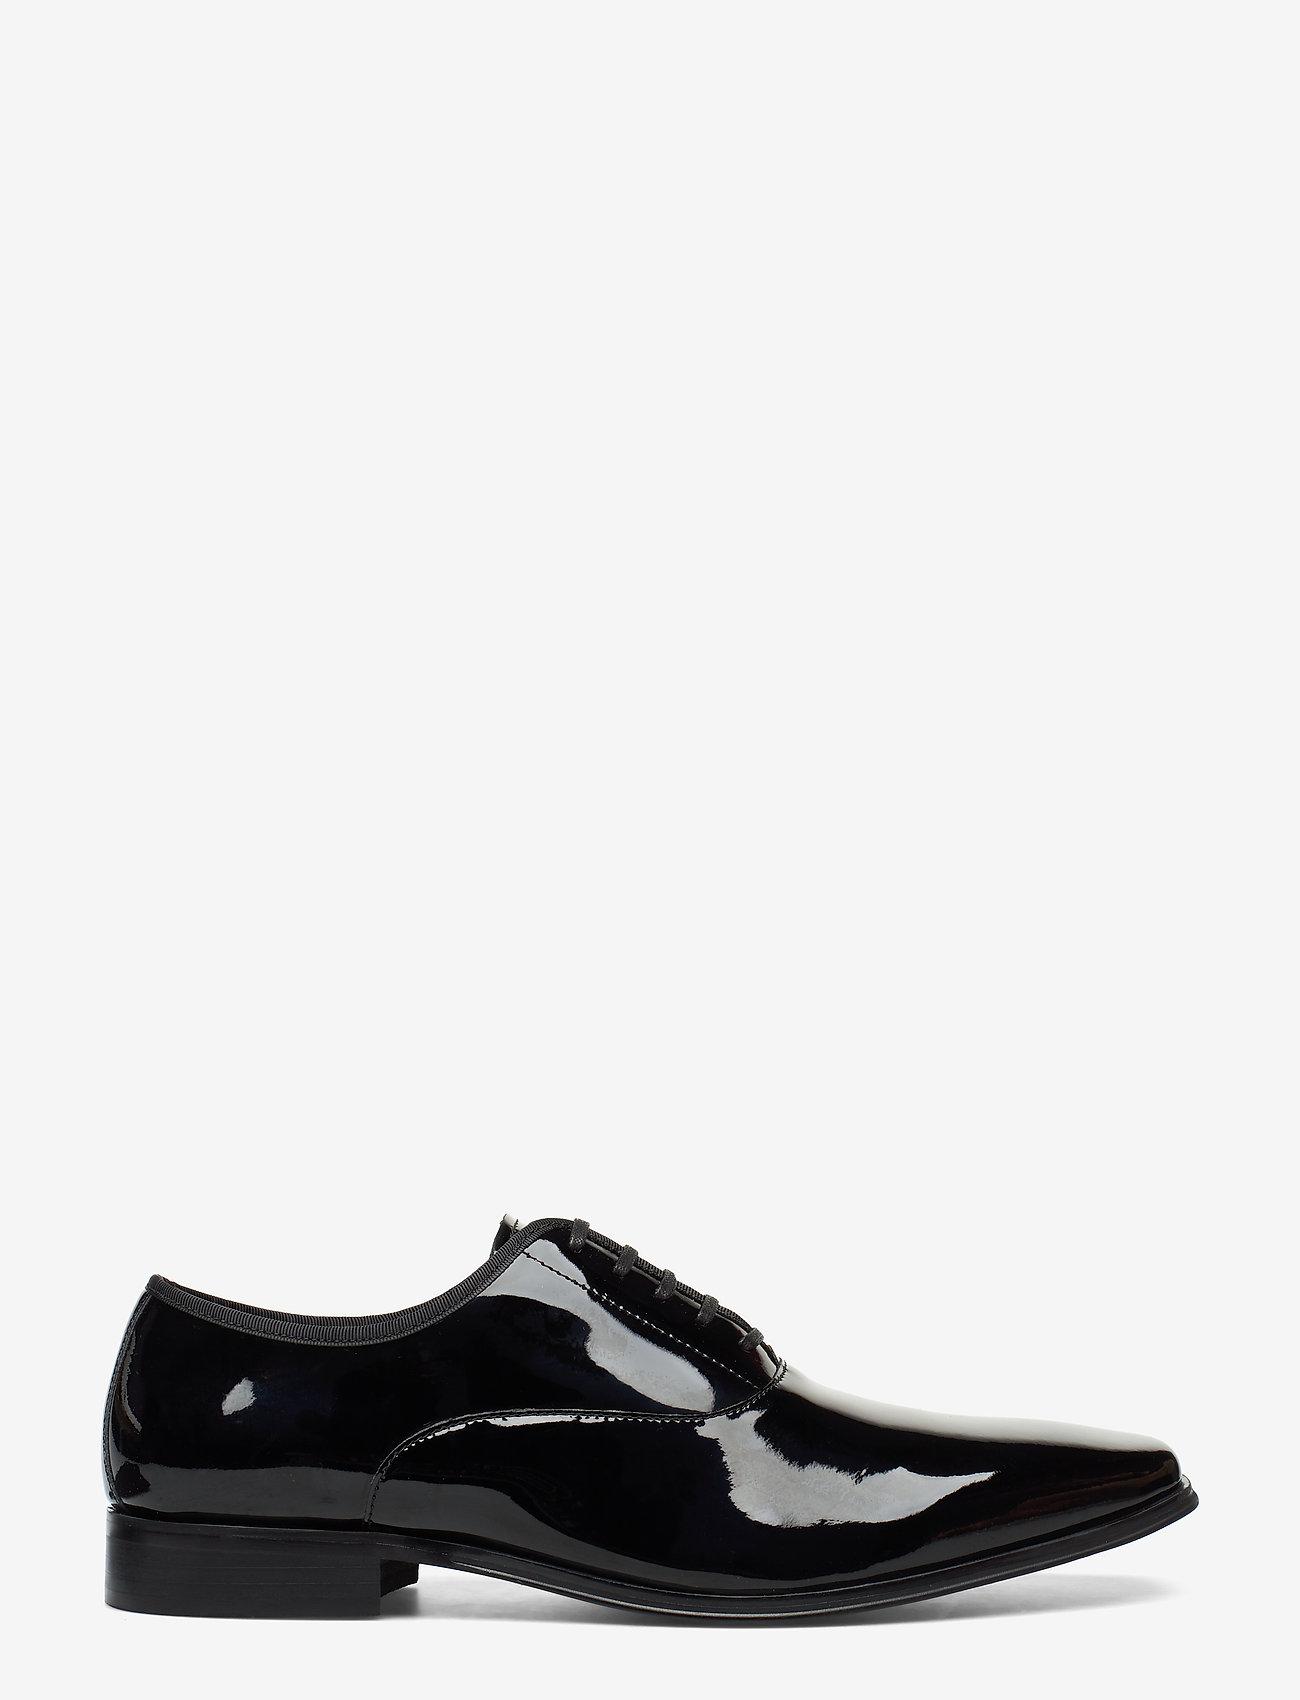 Dune London - POWERMORE - chaussures lacées - black